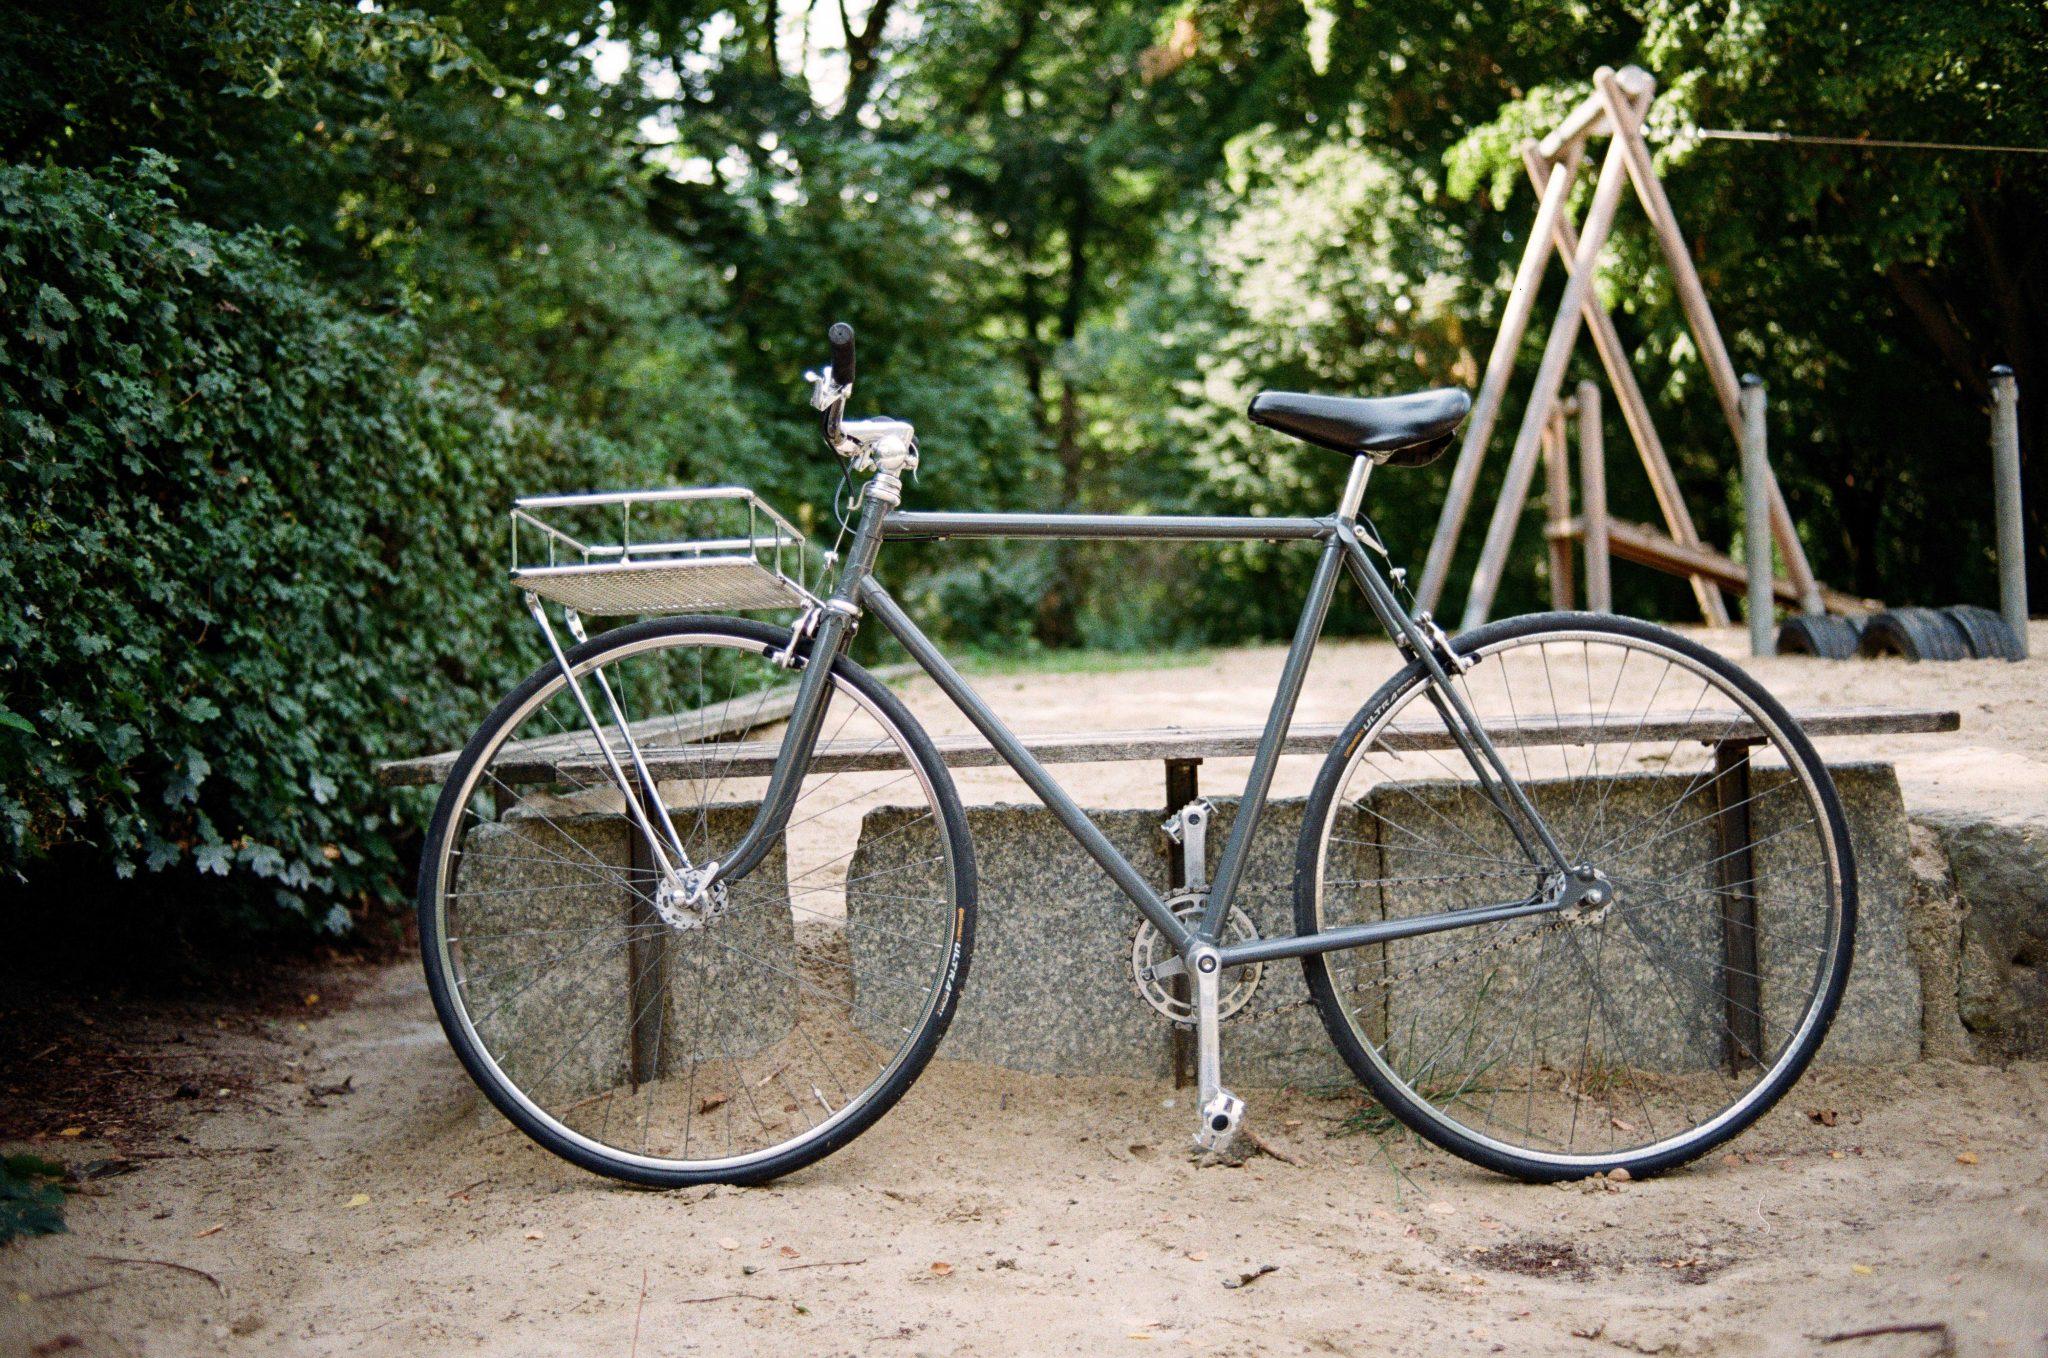 Bremen BlogBerlin Bike scaled